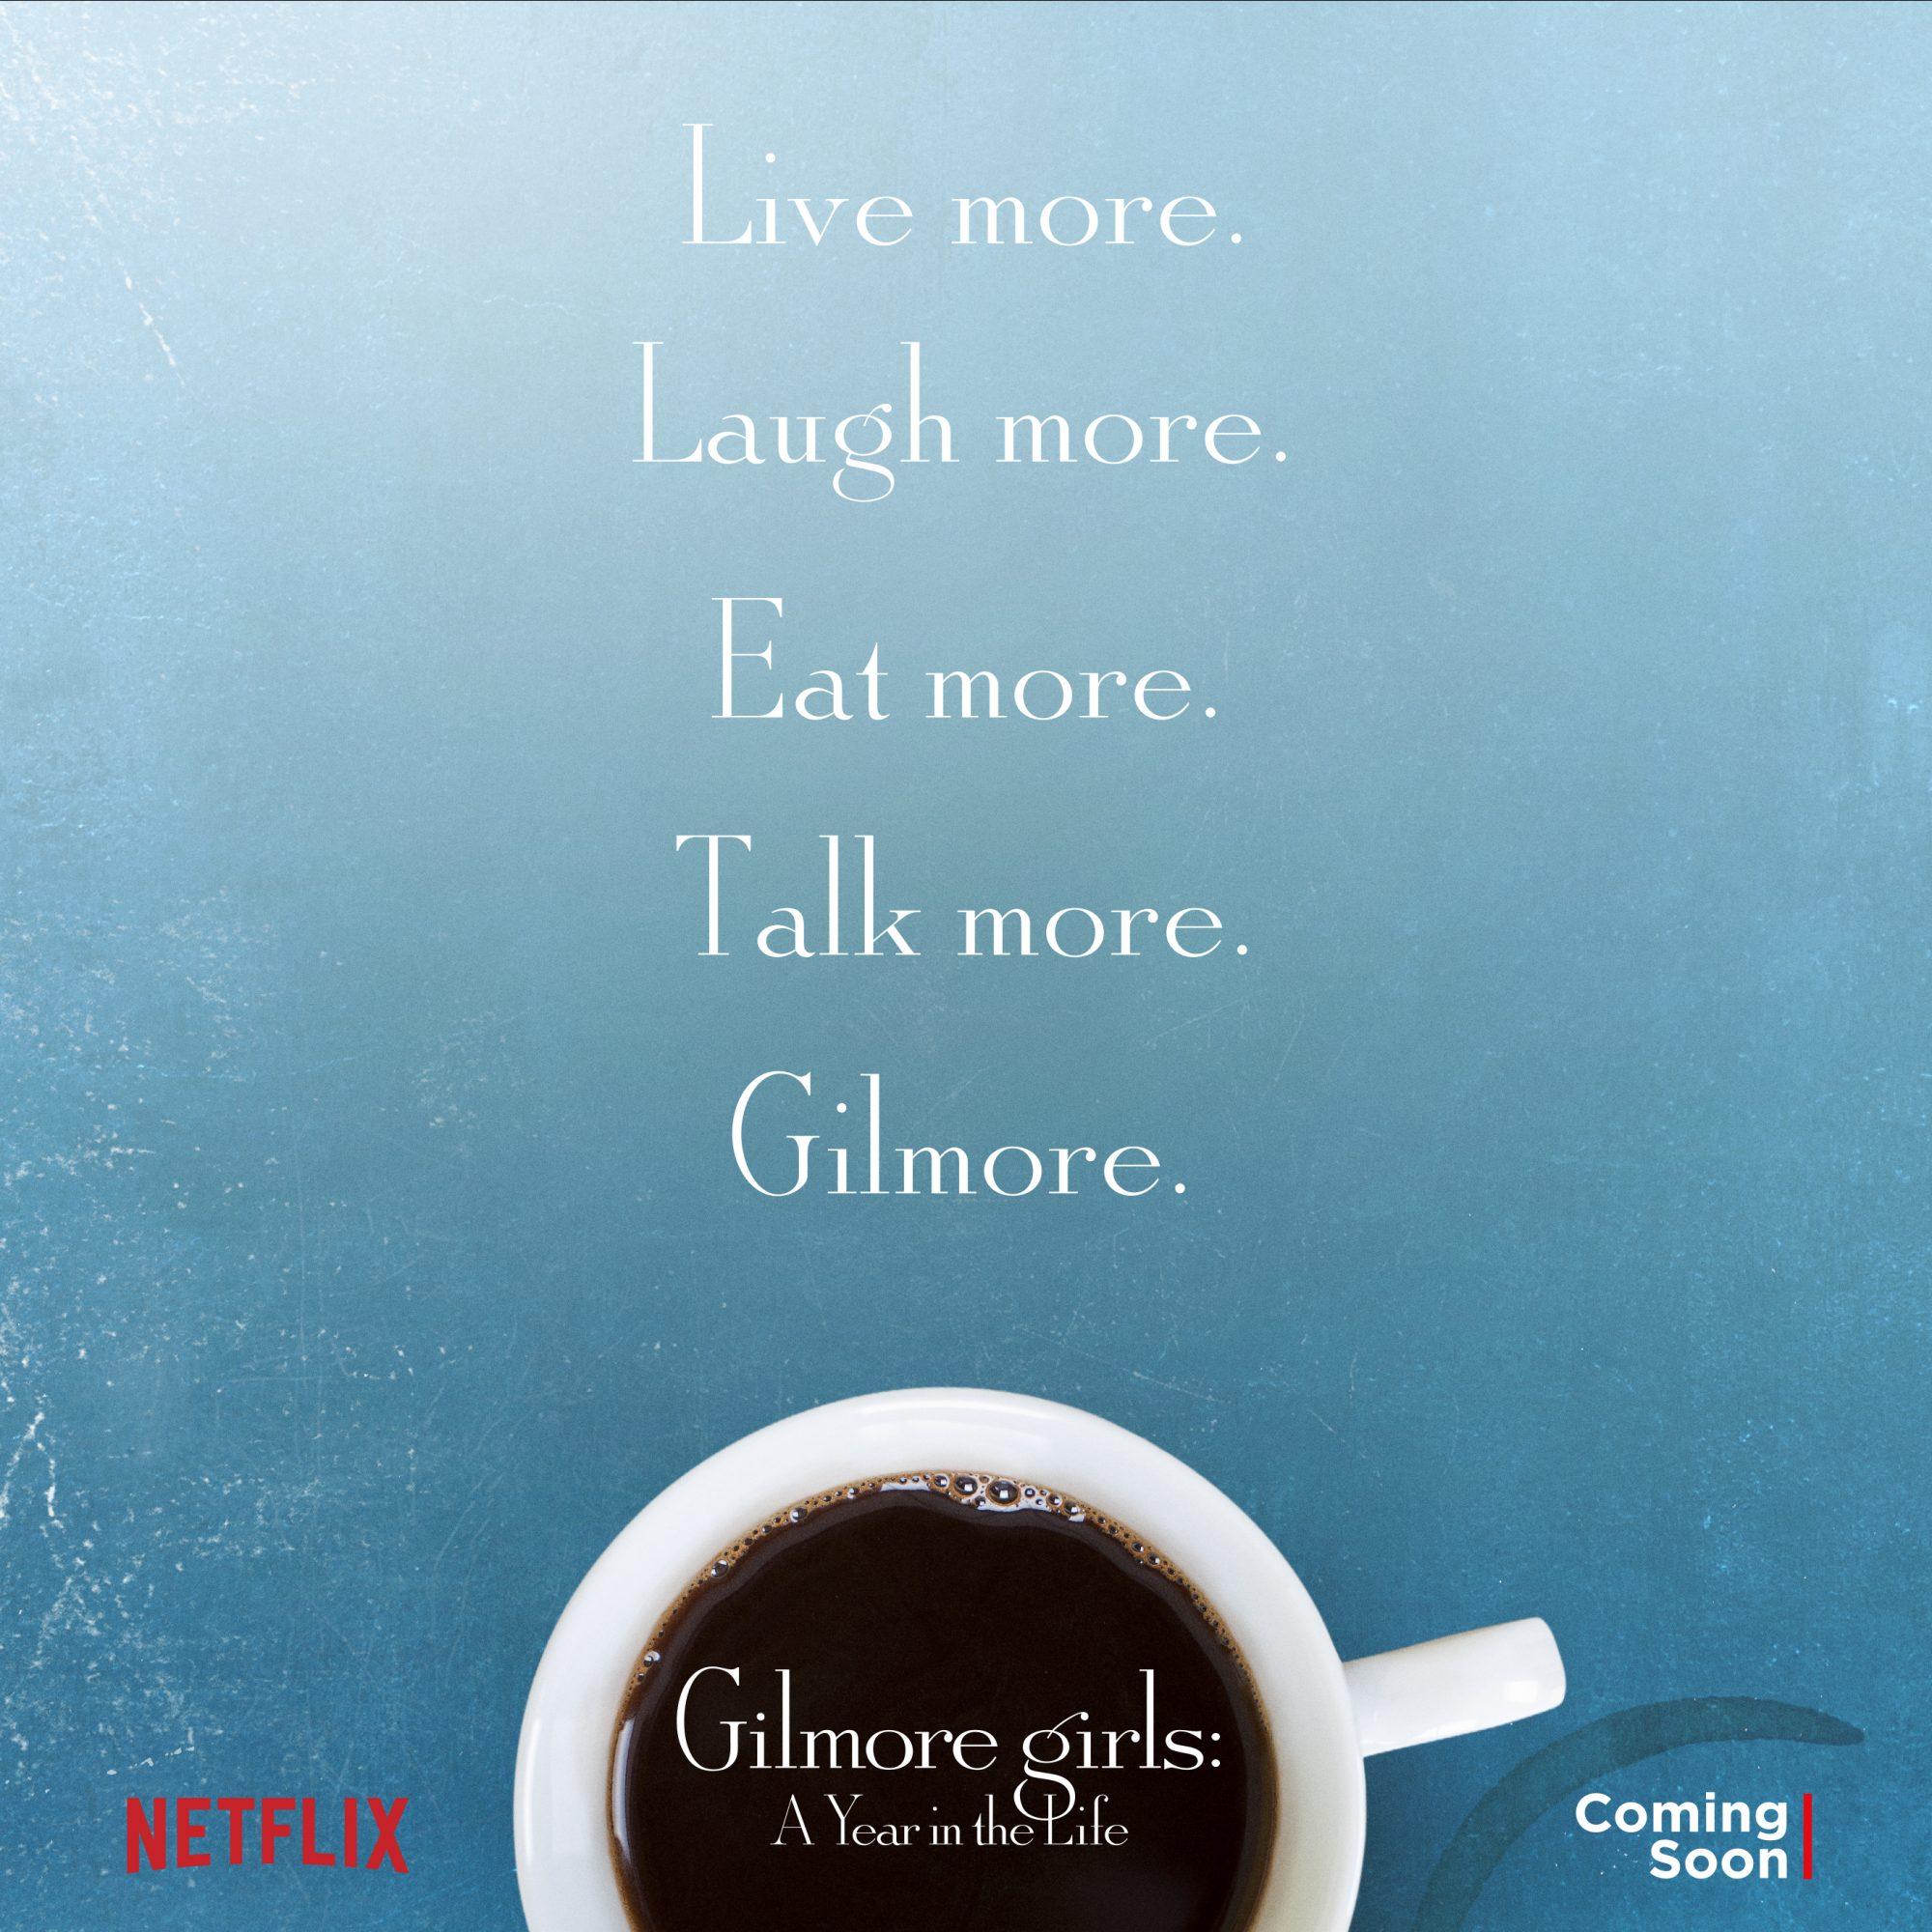 GilmoreGirls_Square_010_RGB_V1.jpg